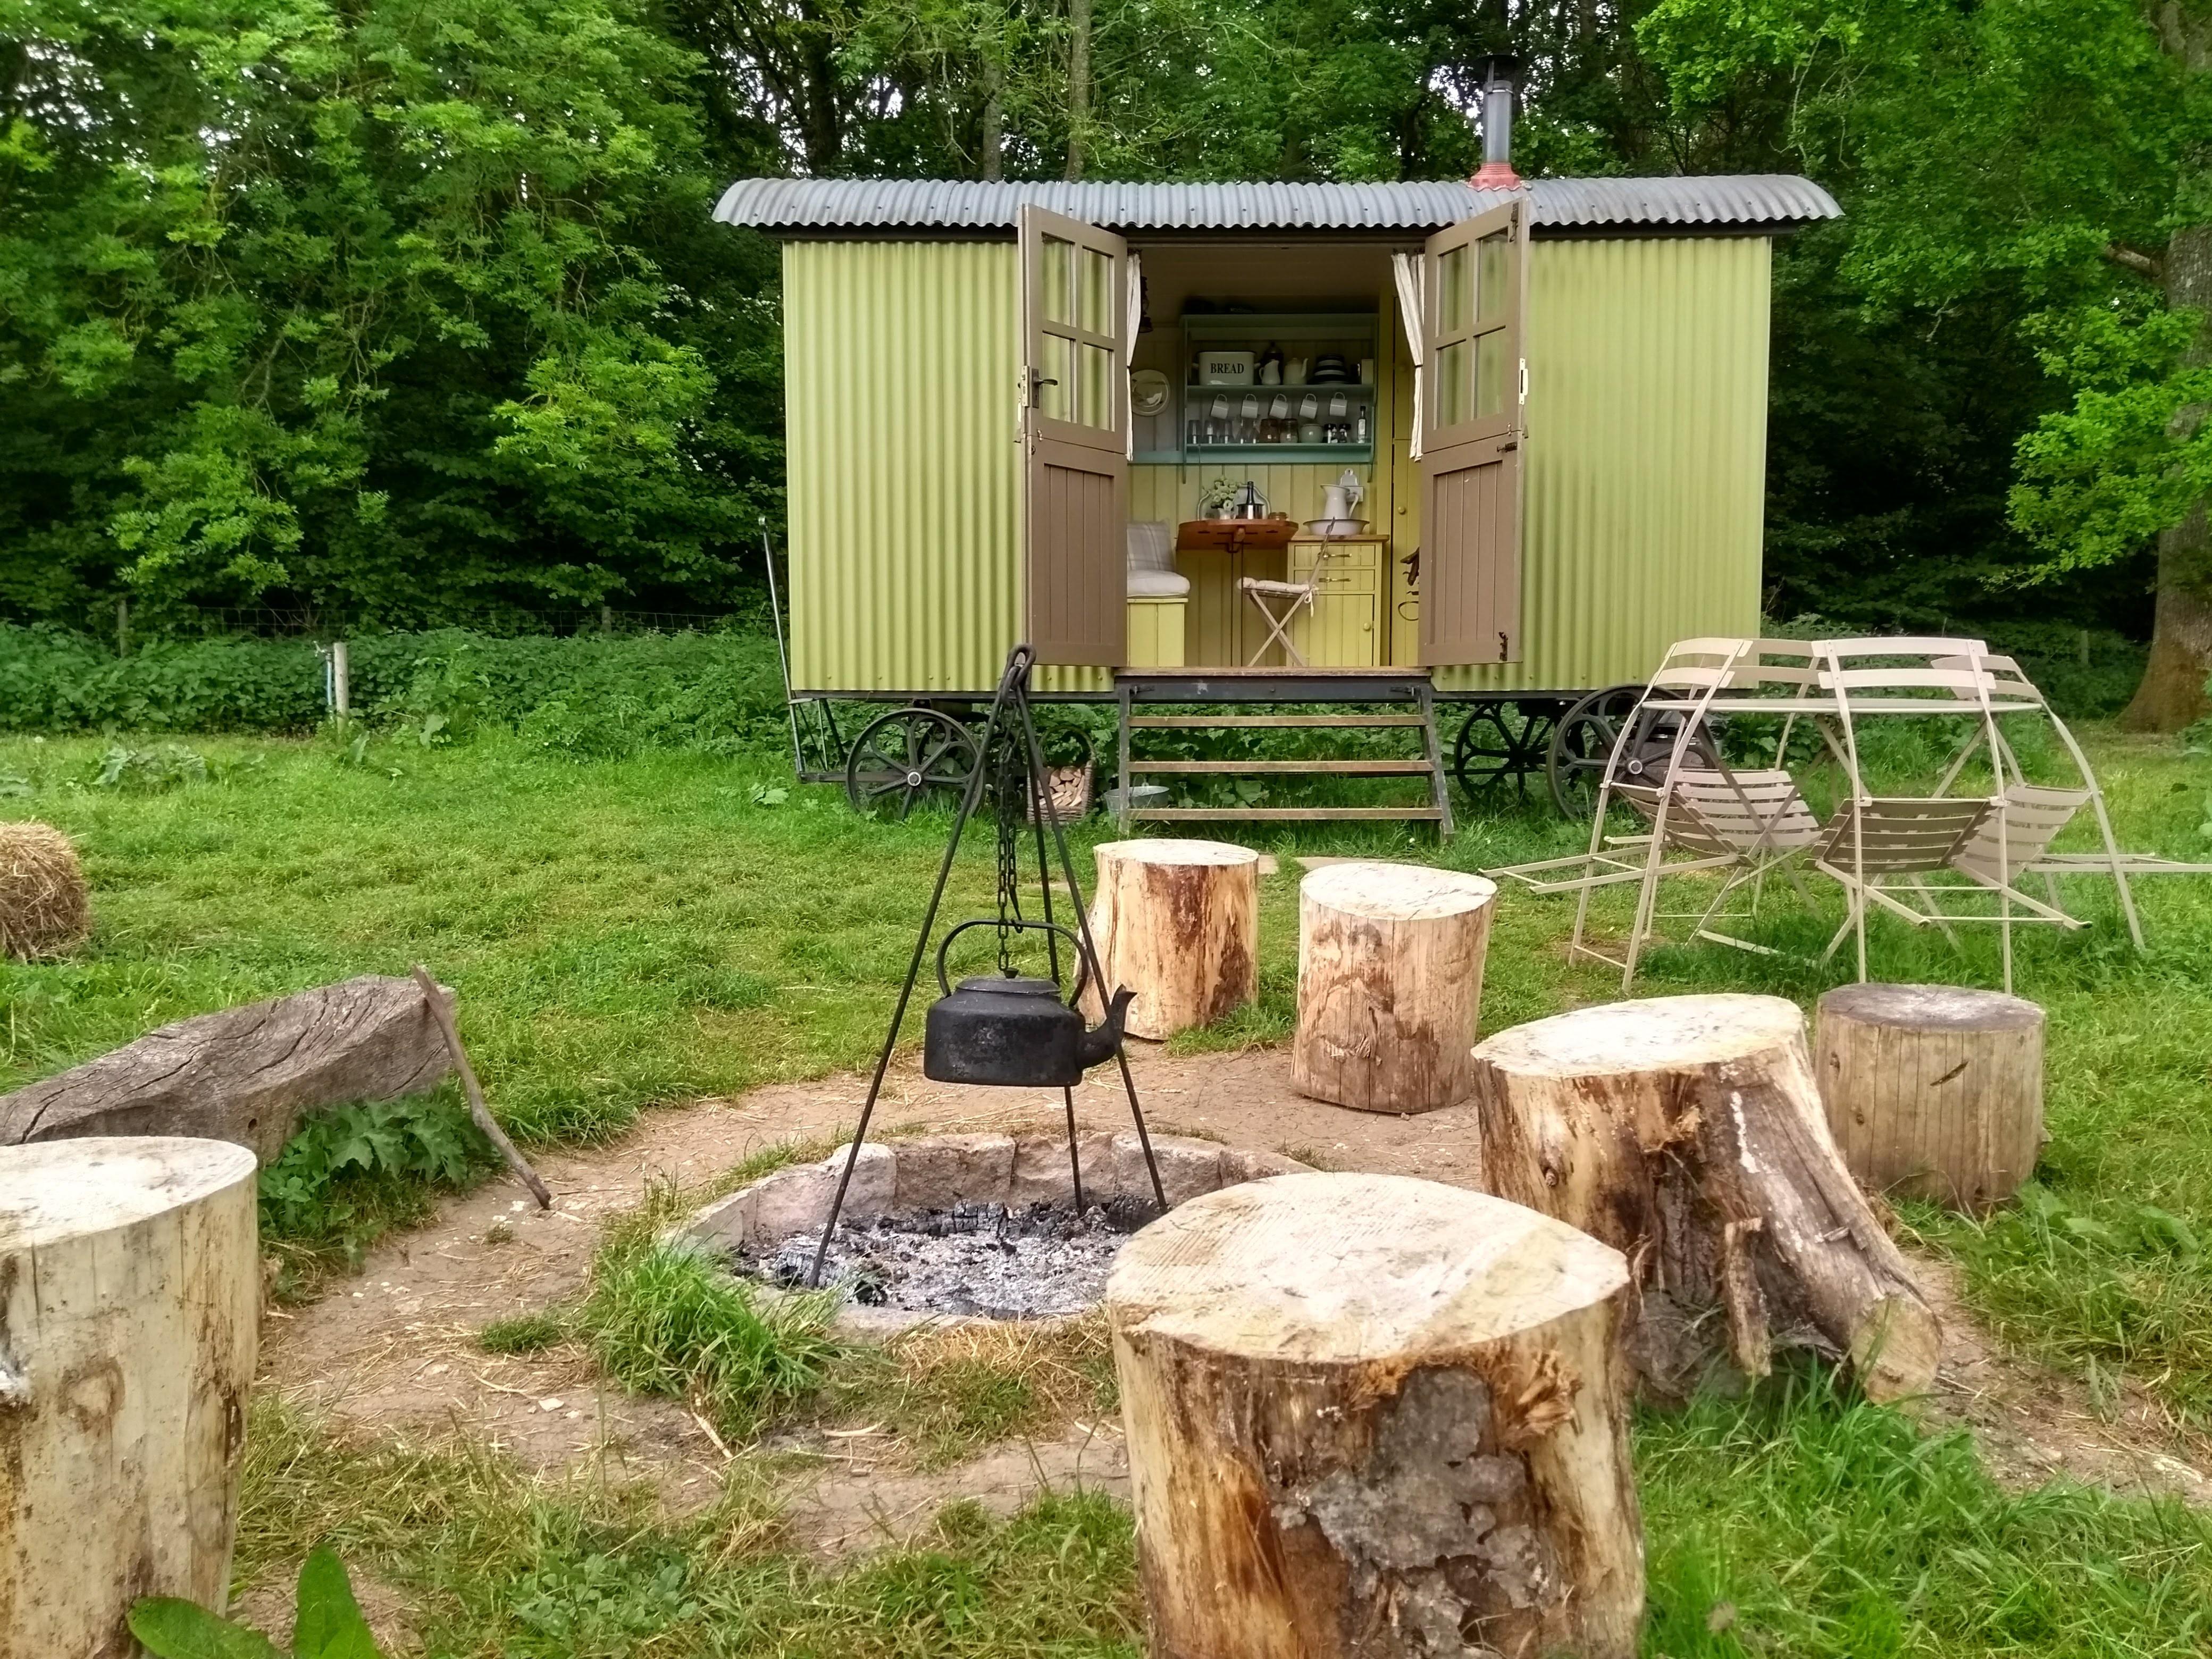 A digital detox at Wriggly Tin Shepherd's Huts